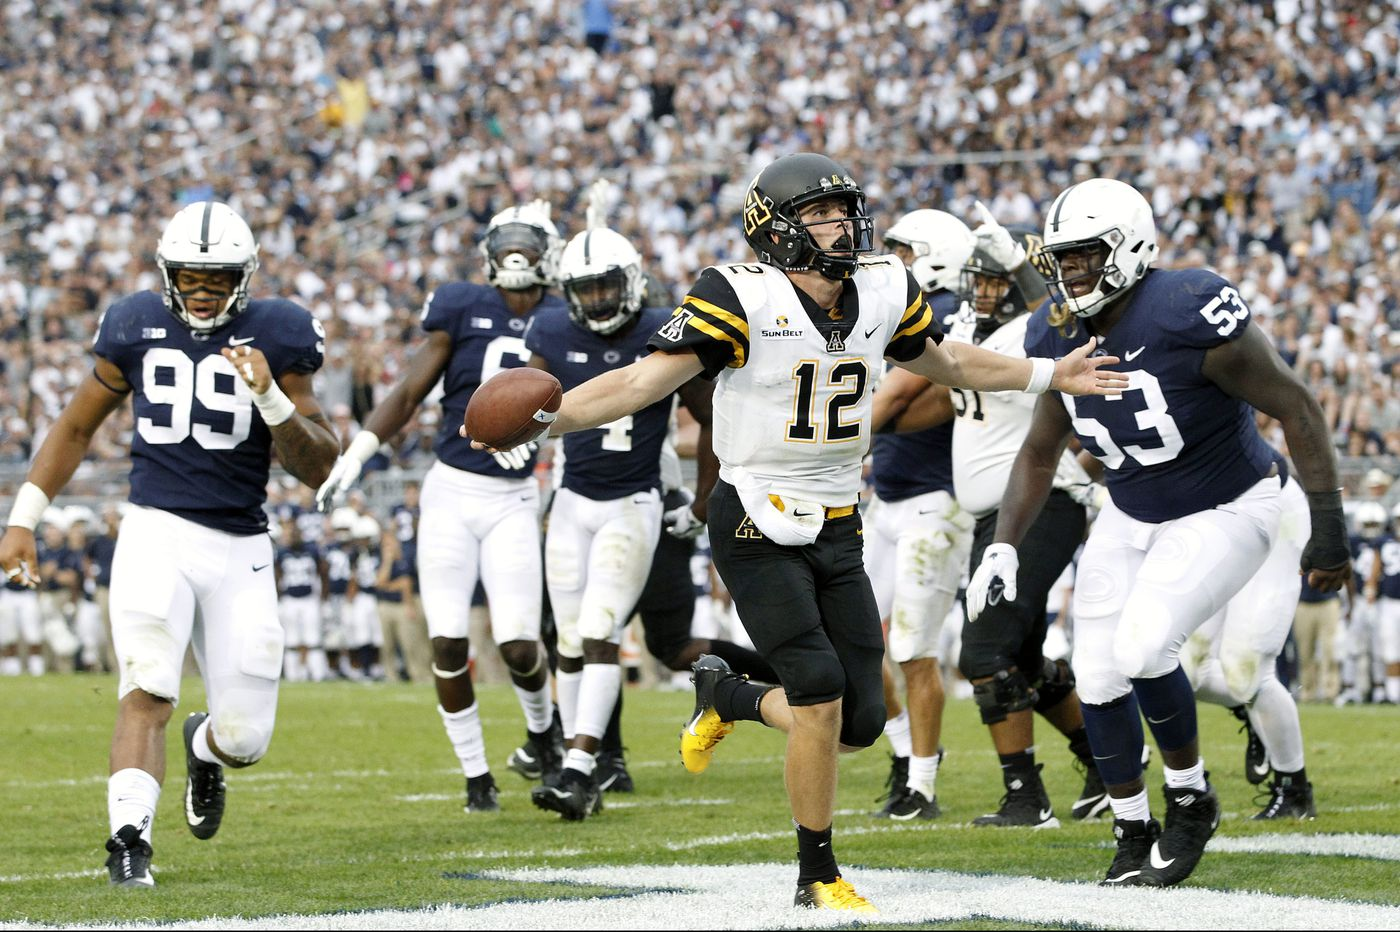 Penn University Football